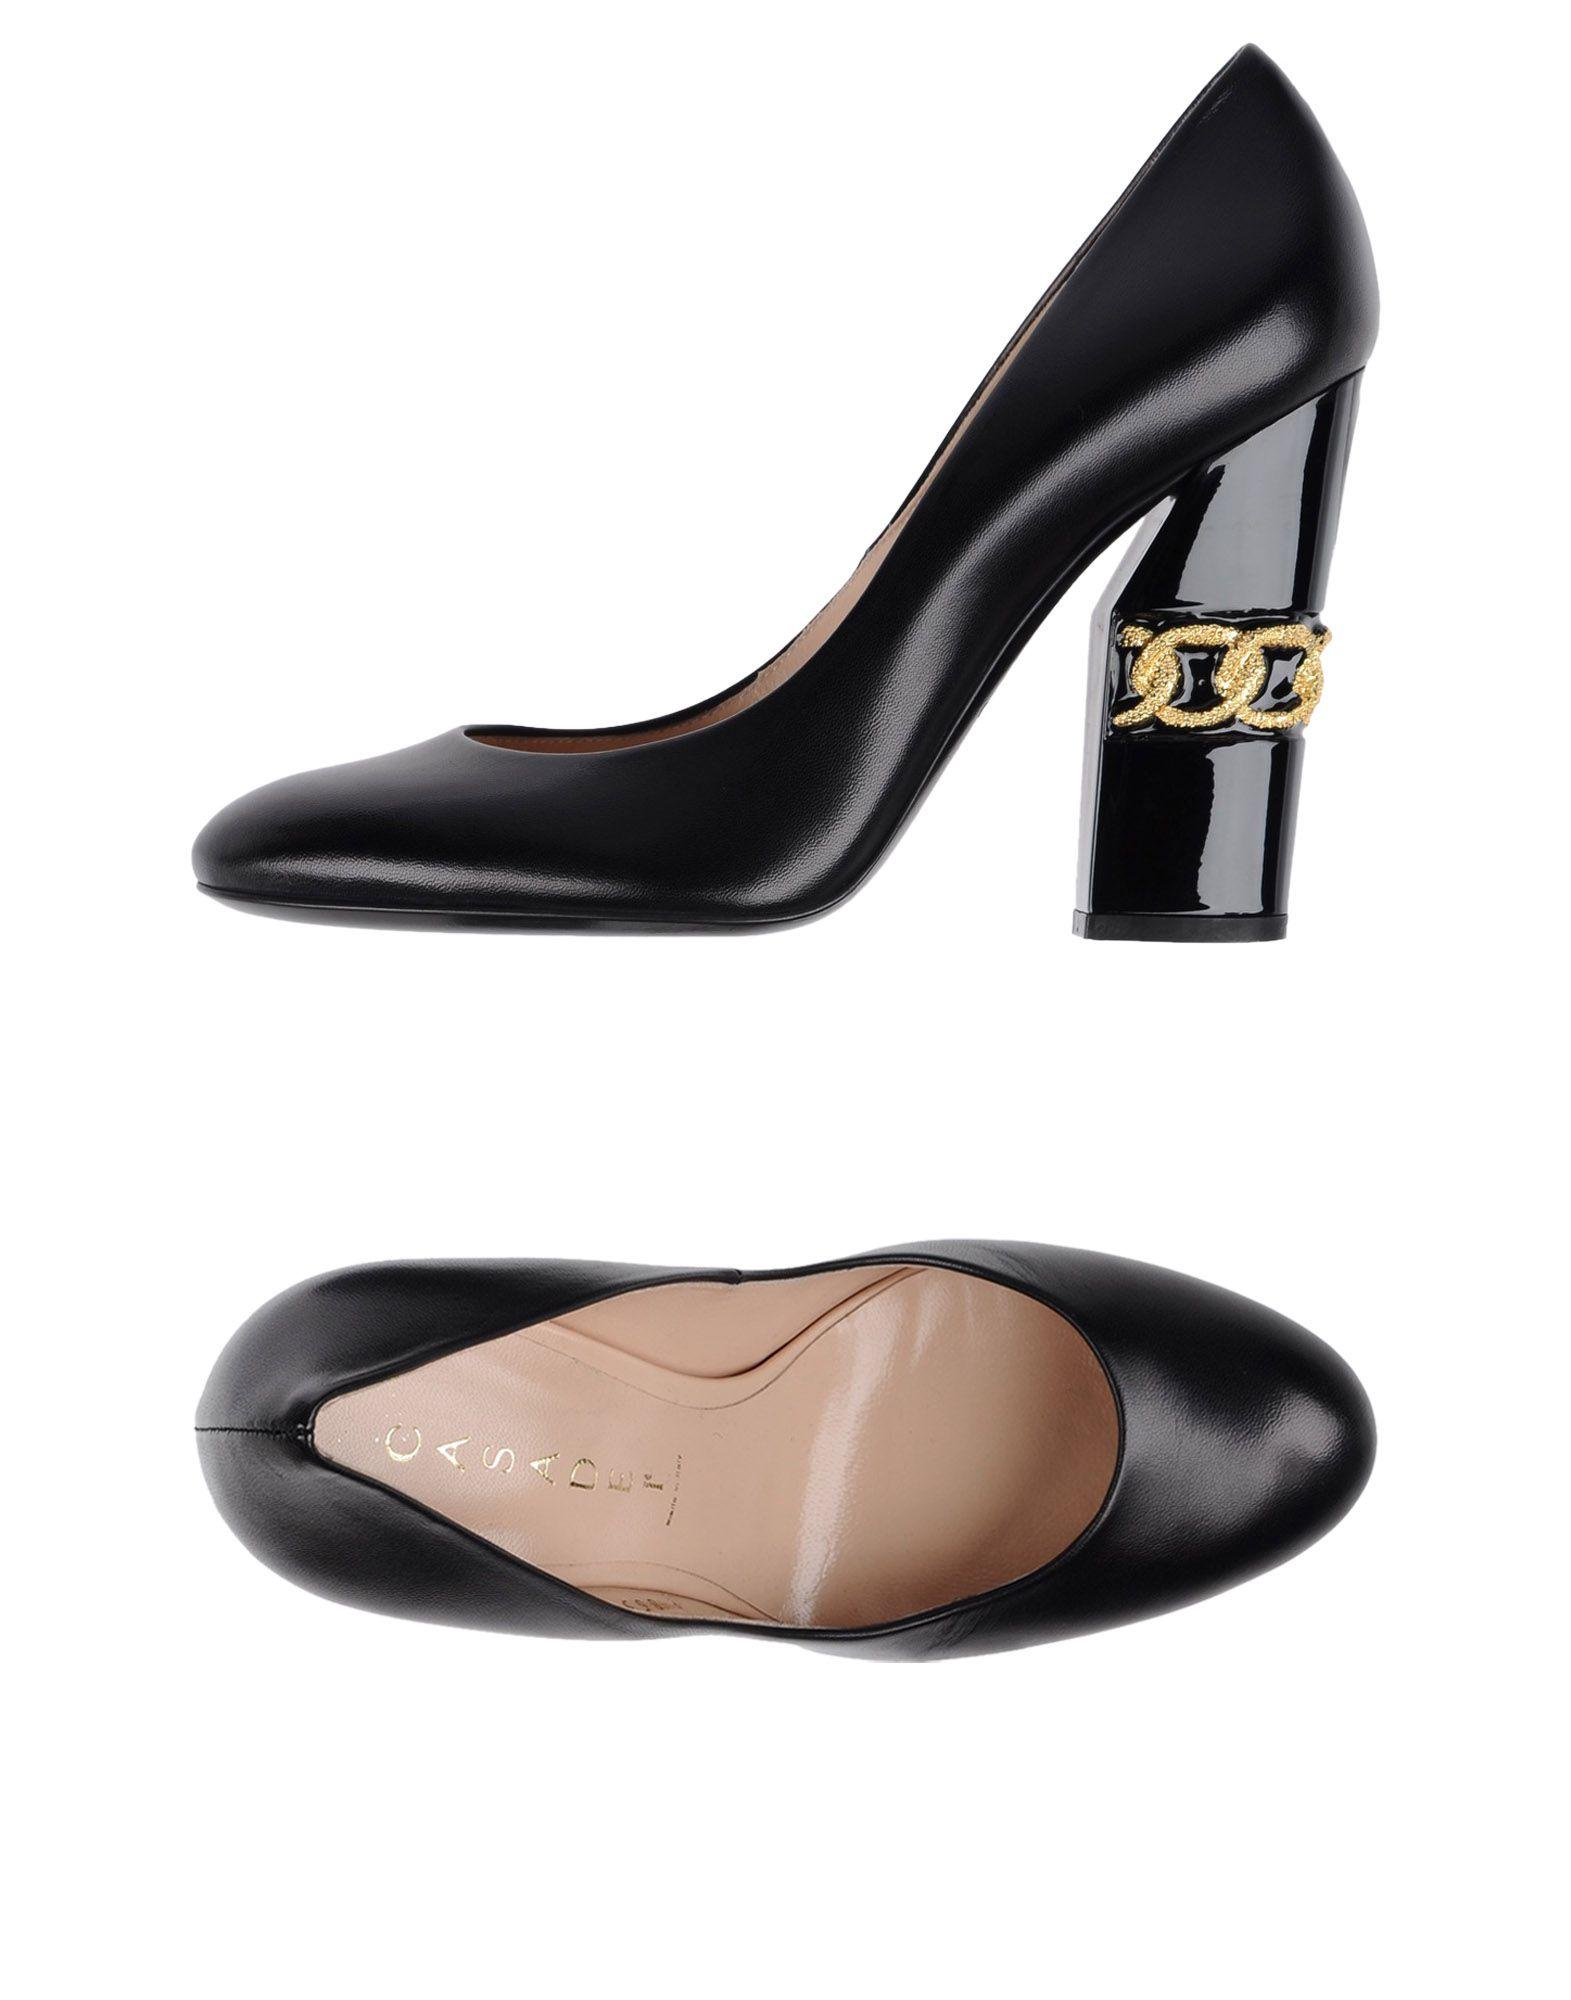 Haltbare Mode billige Schuhe Casadei Pumps Damen  11309126TT Heiße Schuhe